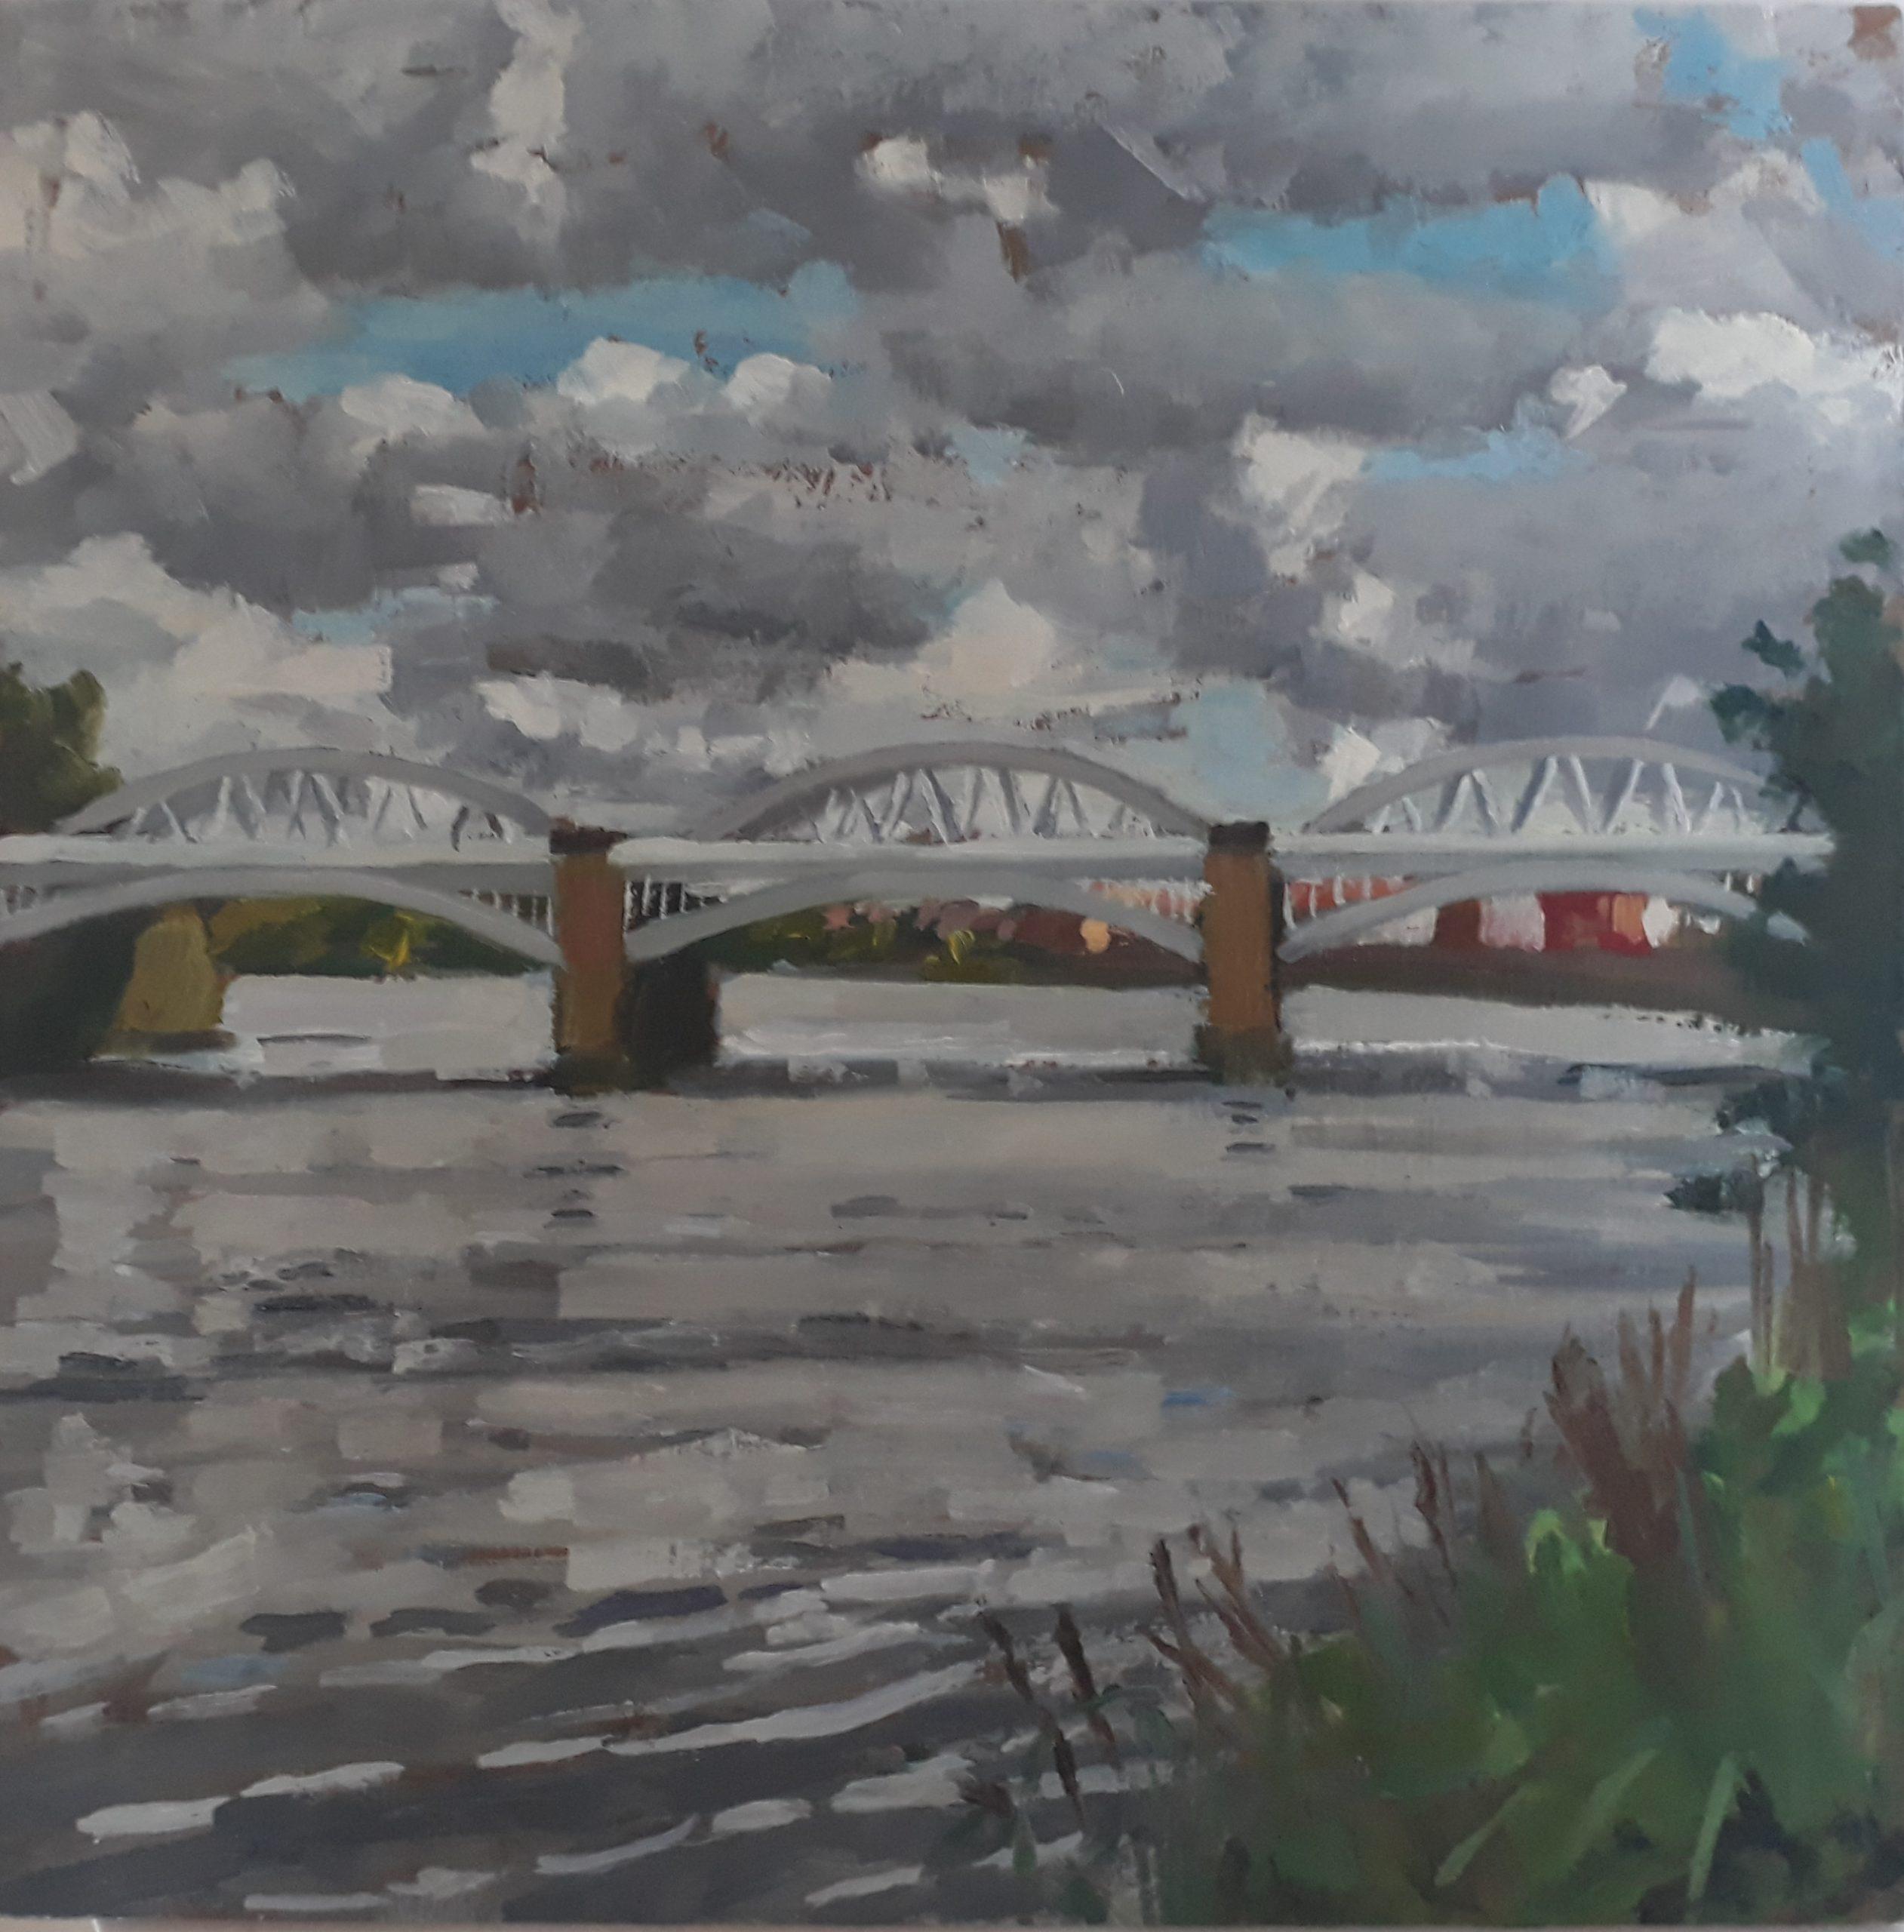 Storm Clouds over Barnes Bridge